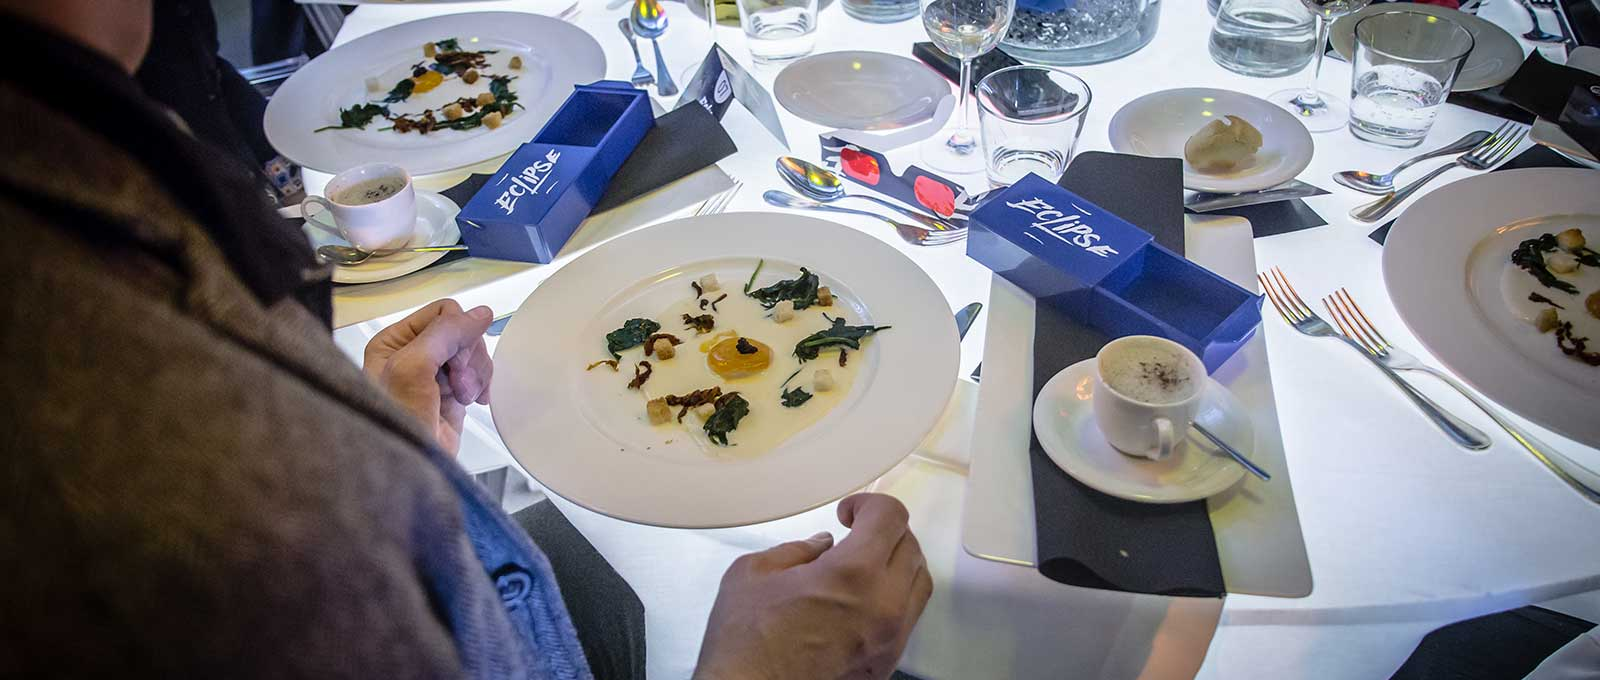 Eclipse dinner gala sow al Saint-Vincent Resort & Casino